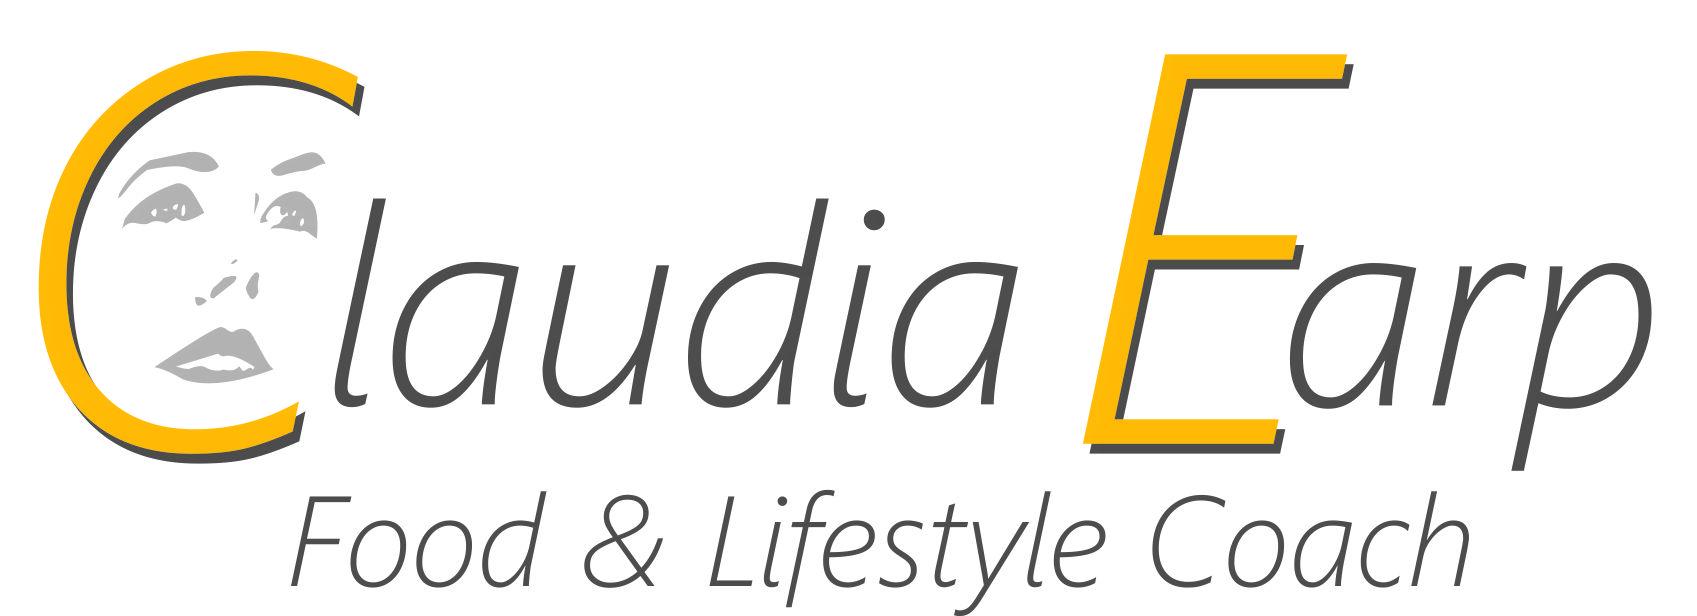 Claudia Earp - Food und Lifestyle Coach